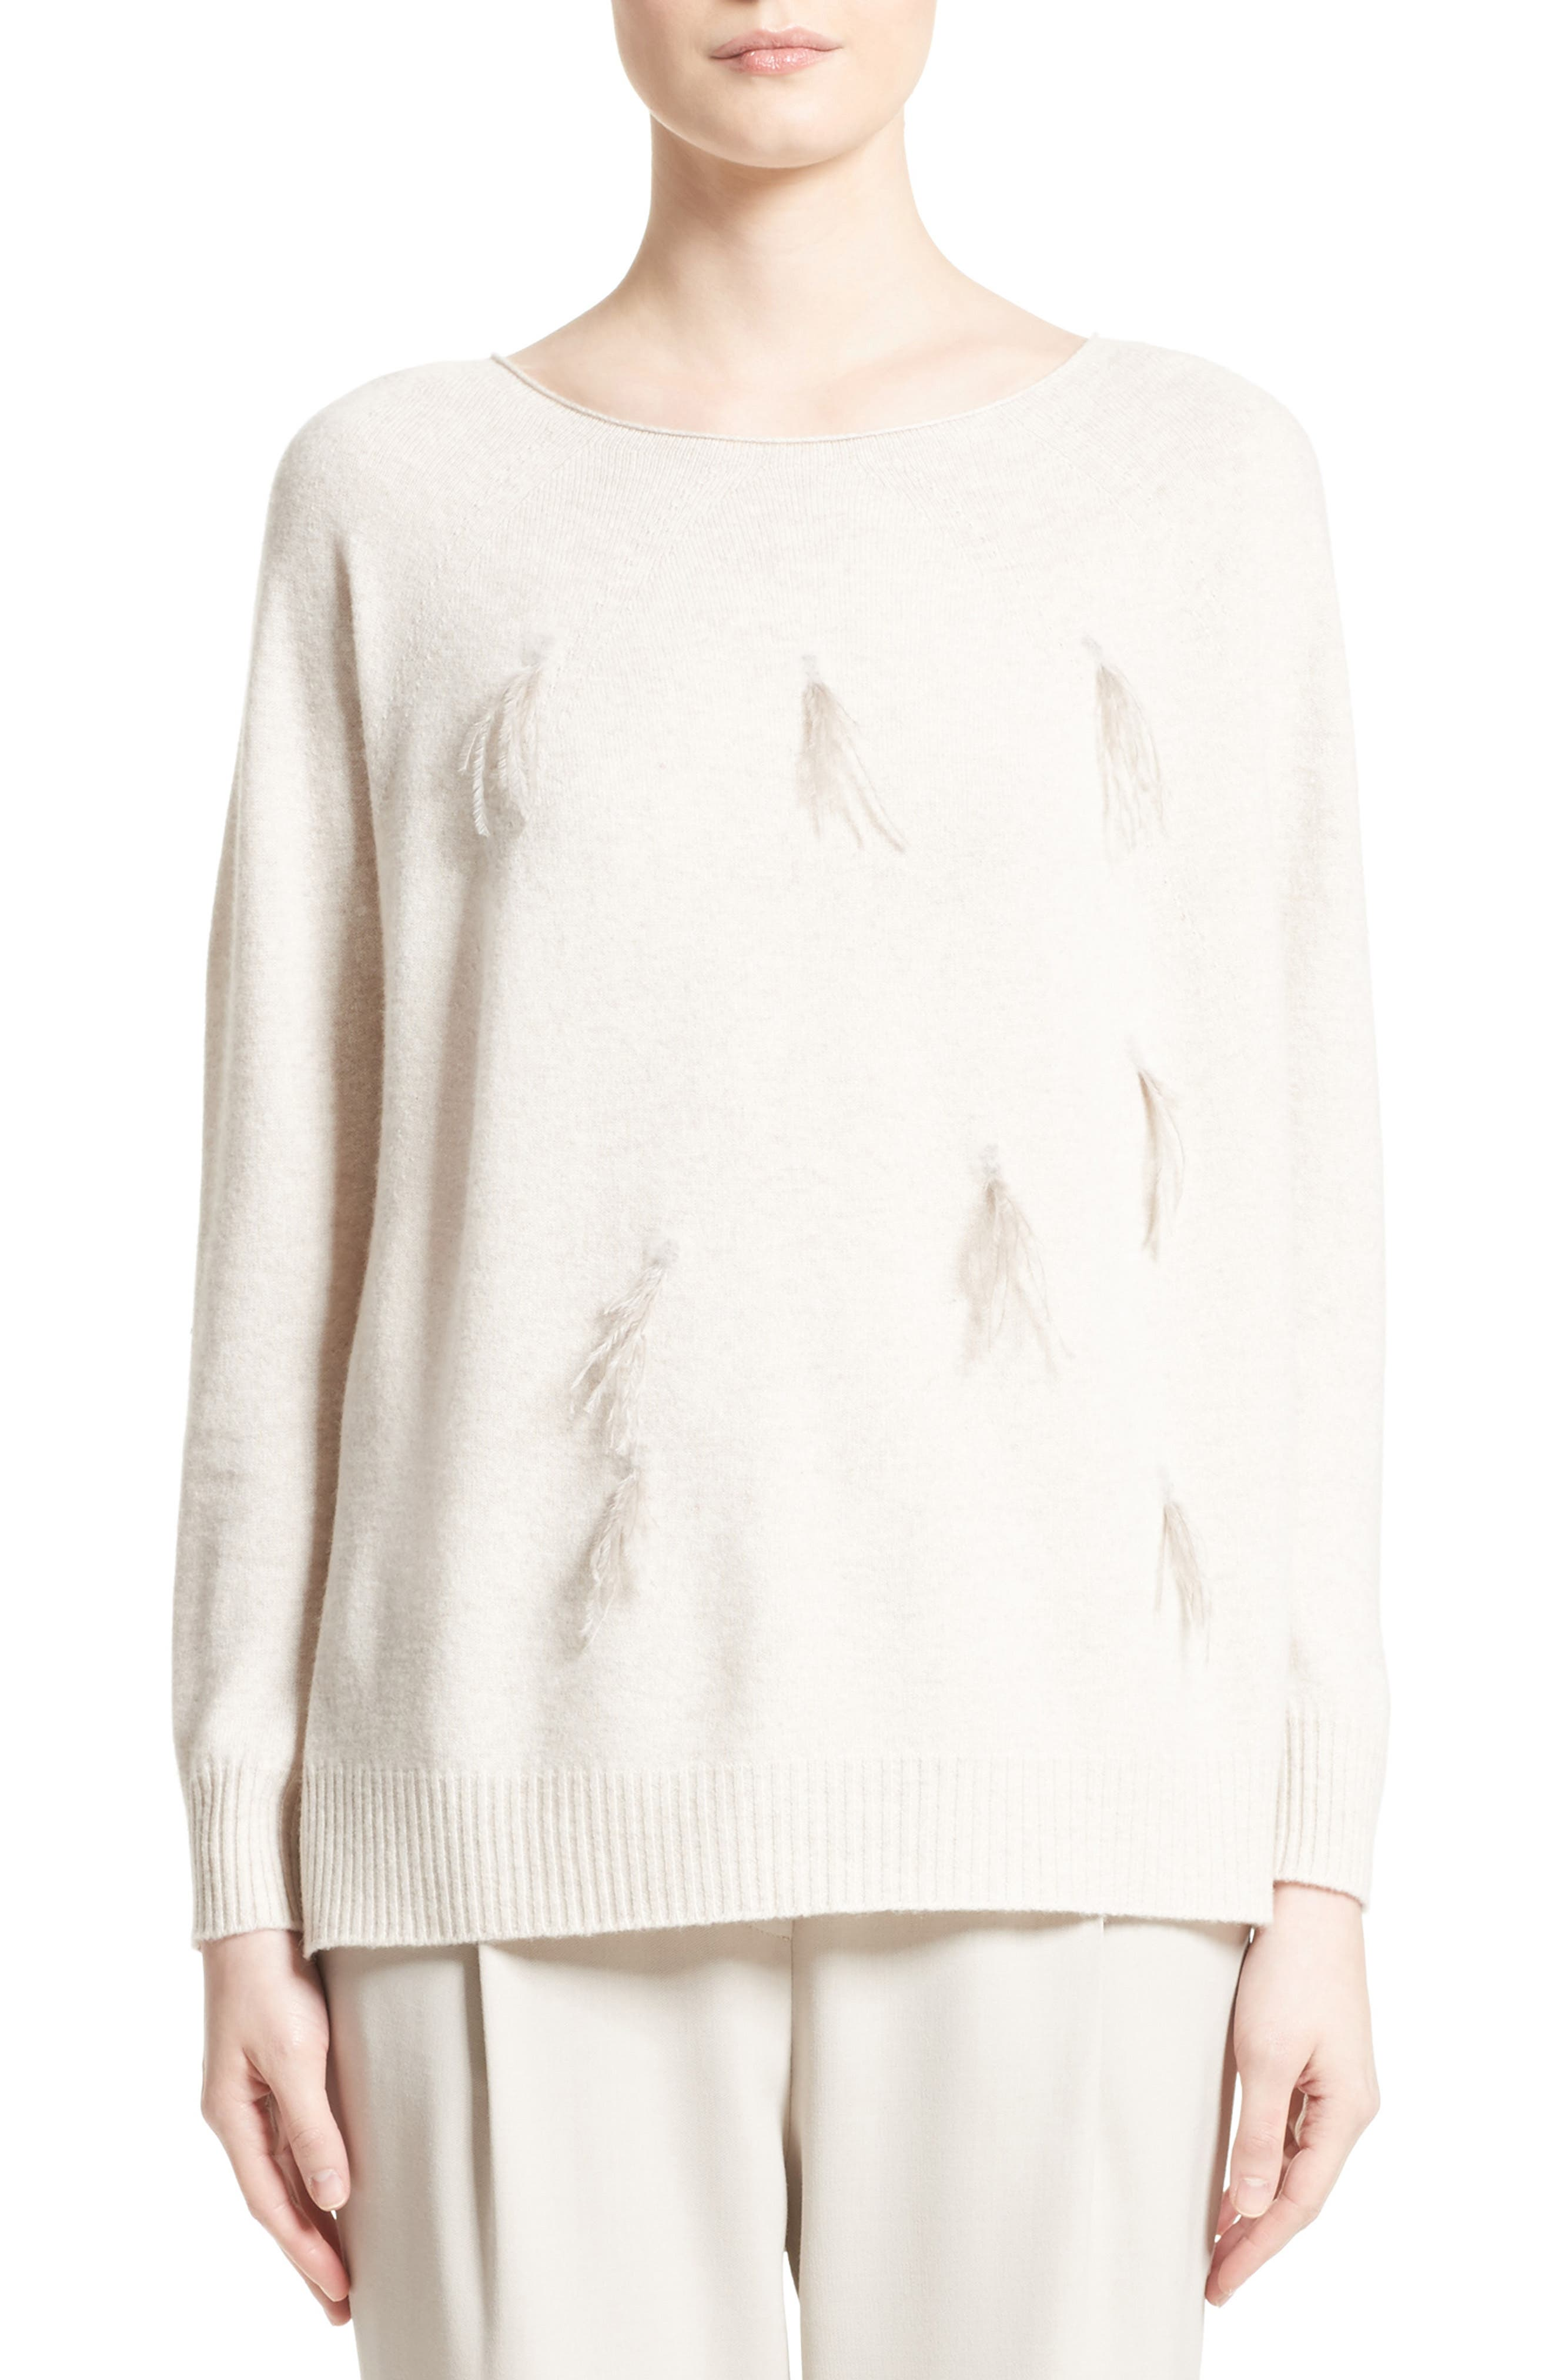 Fabiana Filippi Needle Punch Ostrich Feather Trim Sweater